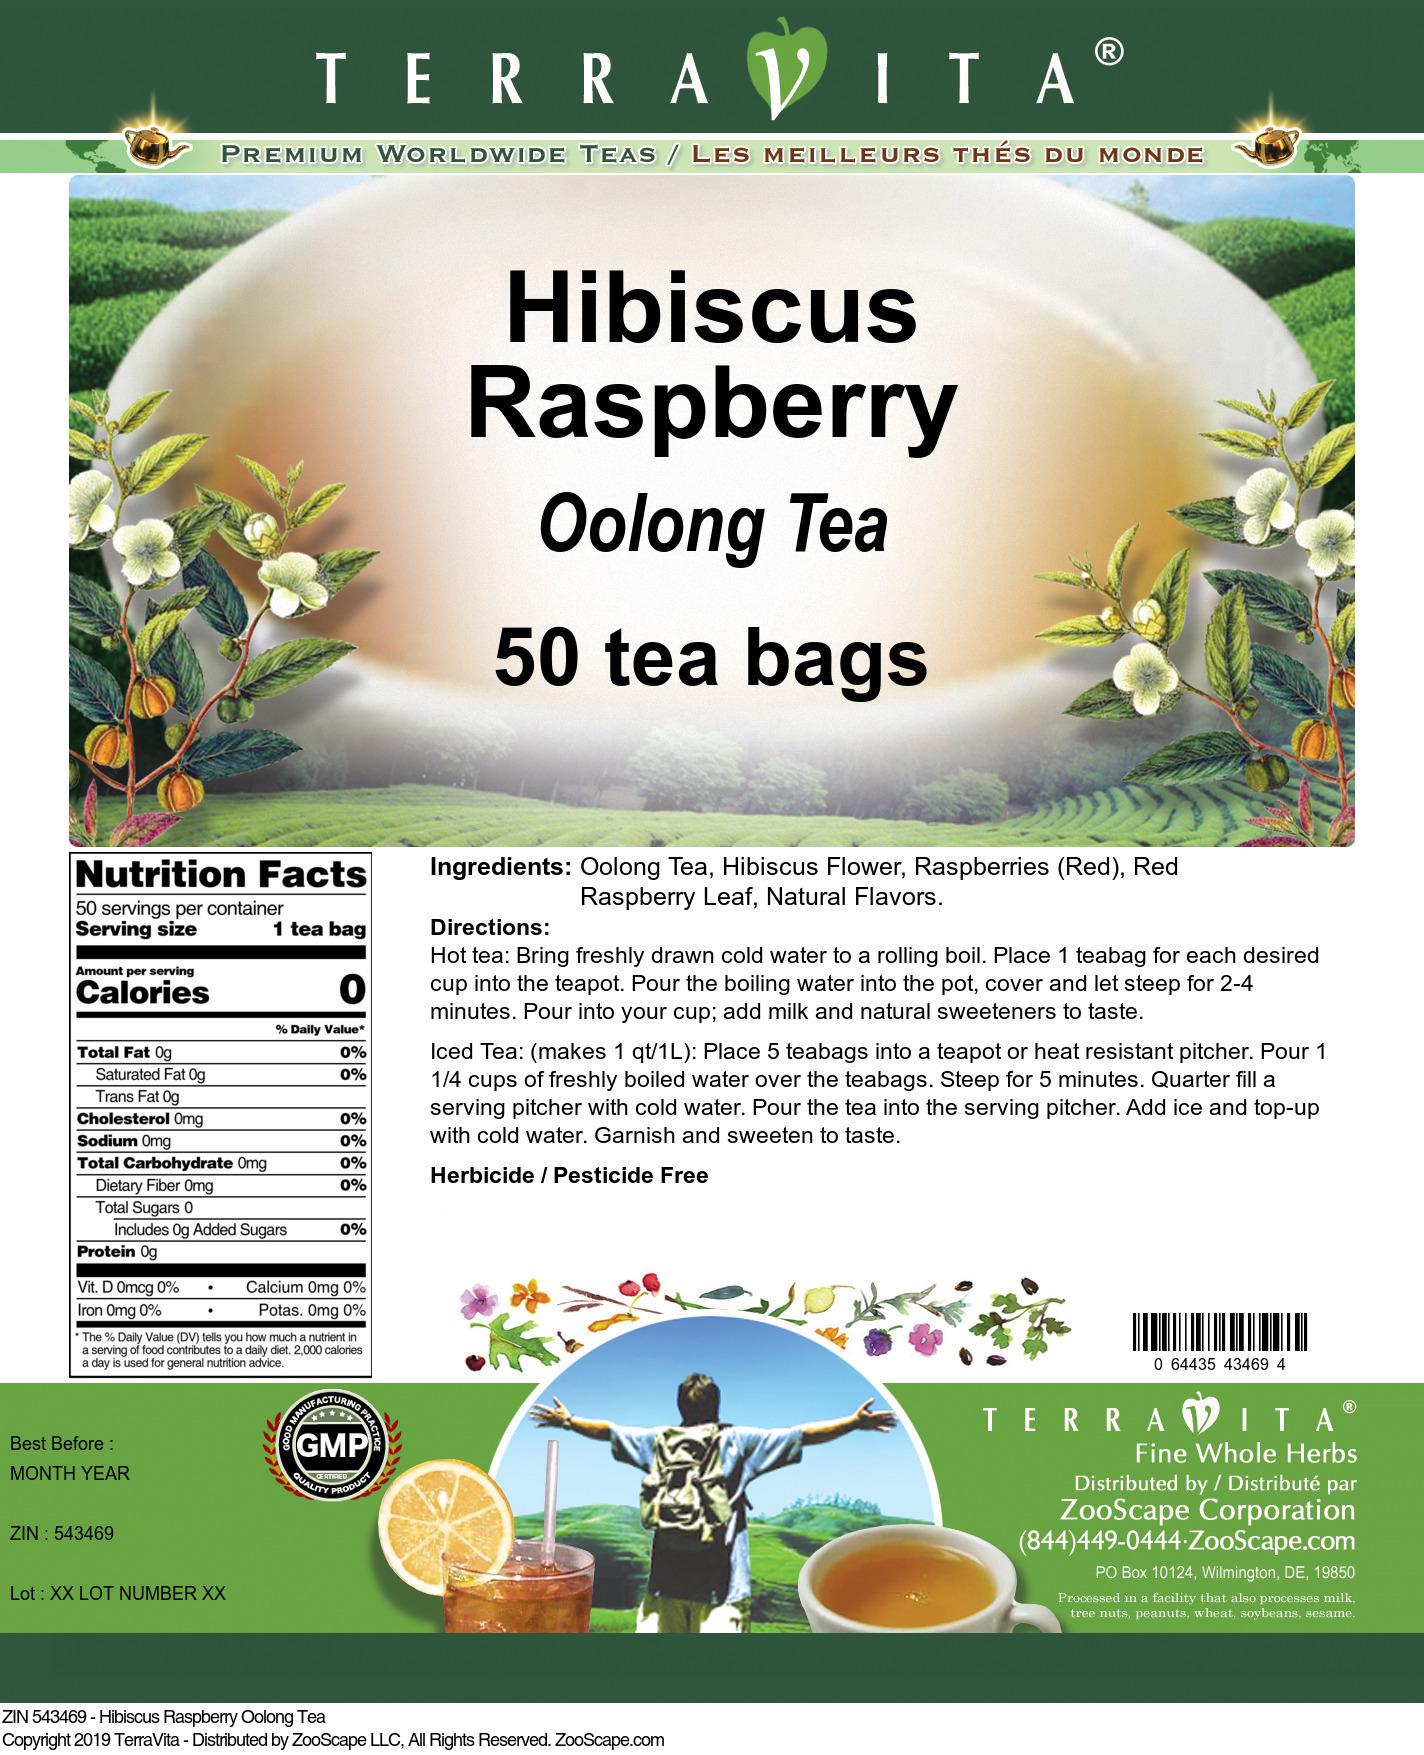 Hibiscus Raspberry Oolong Tea